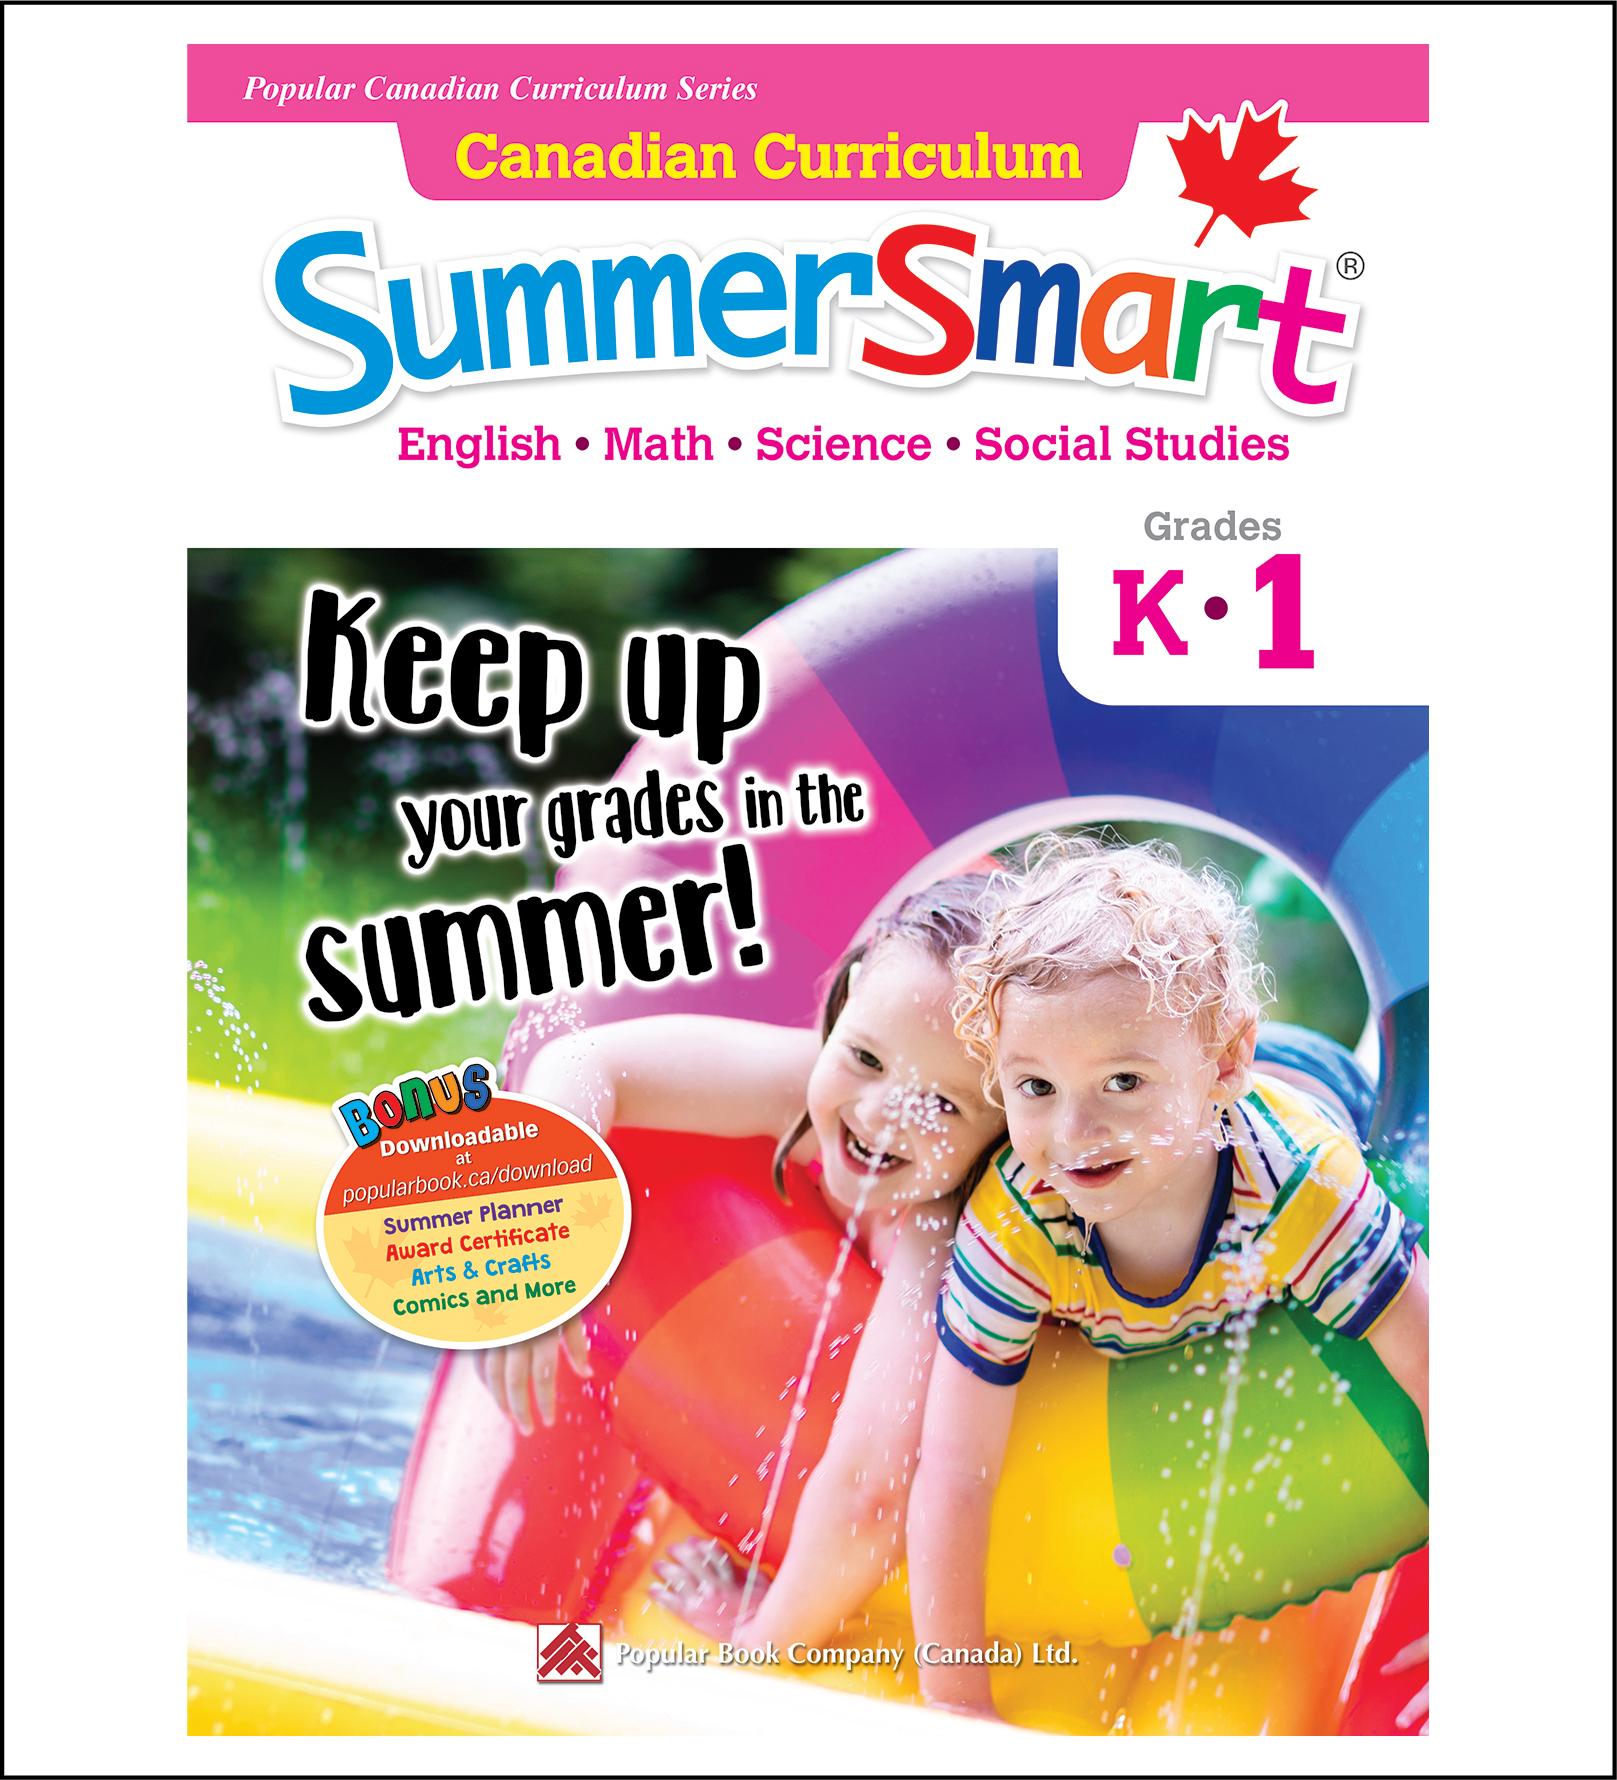 Canadian Curriculum SummerSmart Grades K-1-0